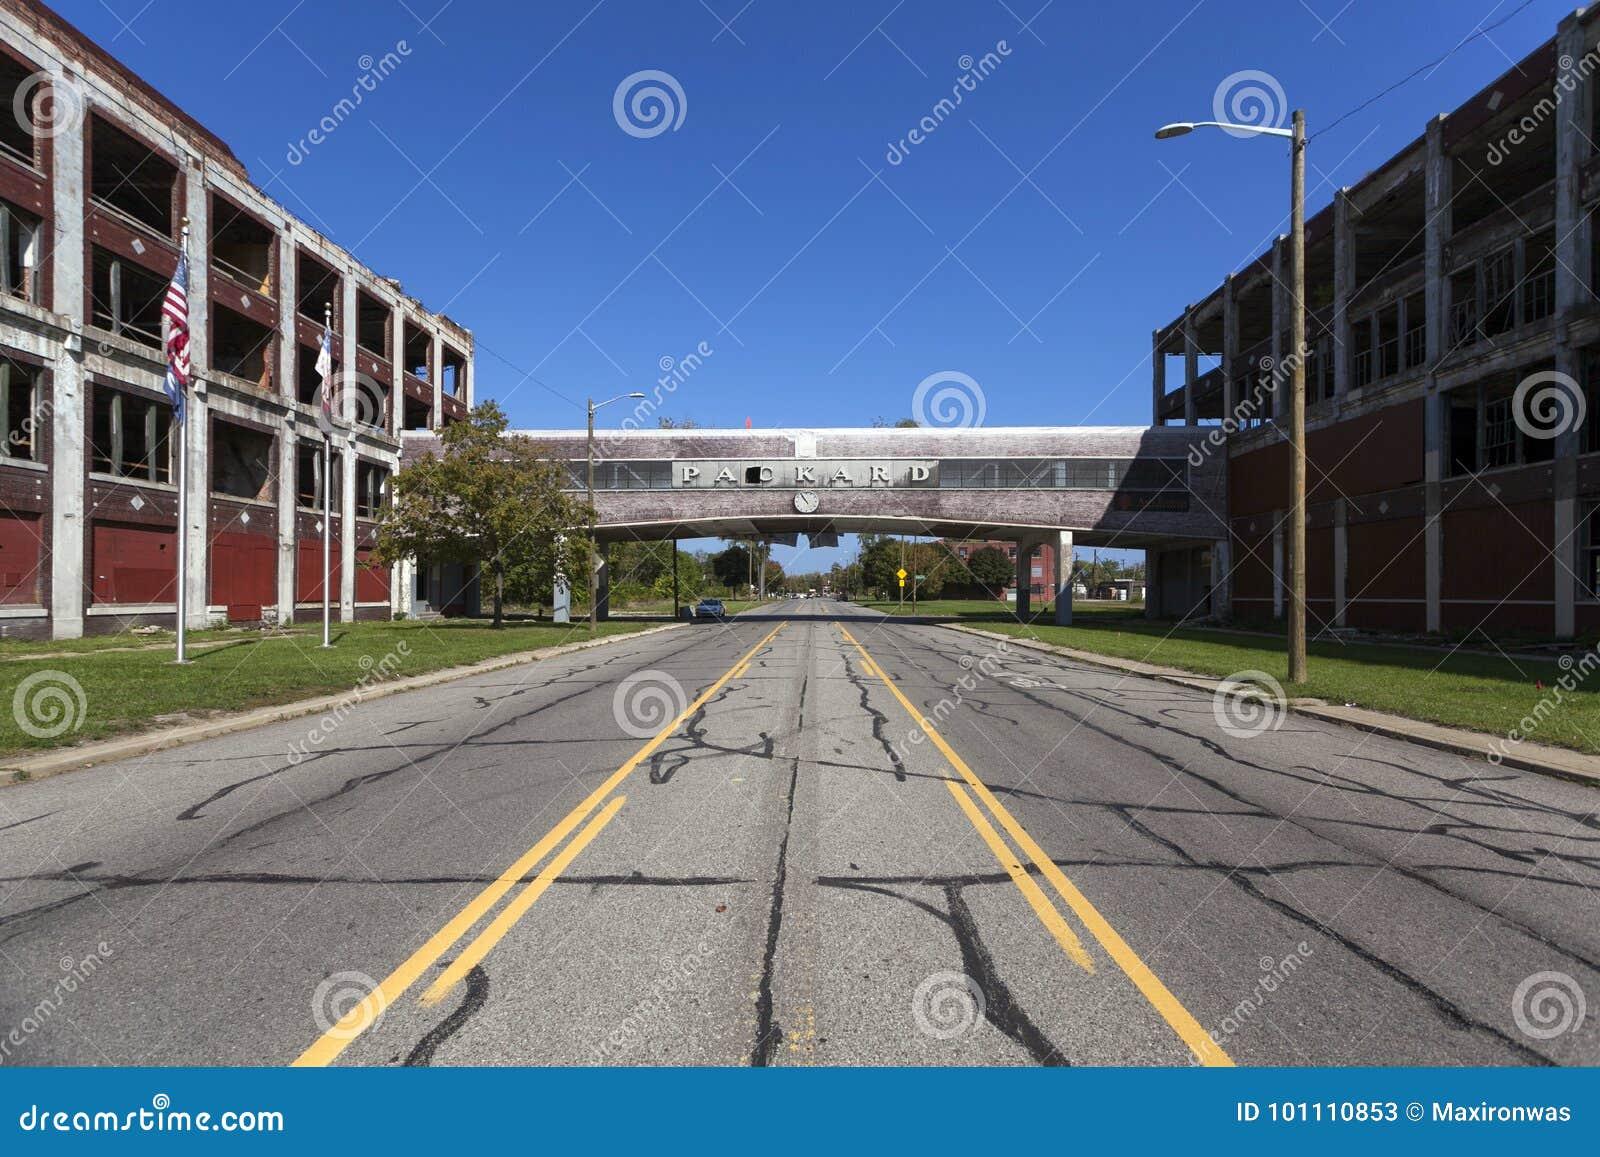 USA - Michigan - Detroit